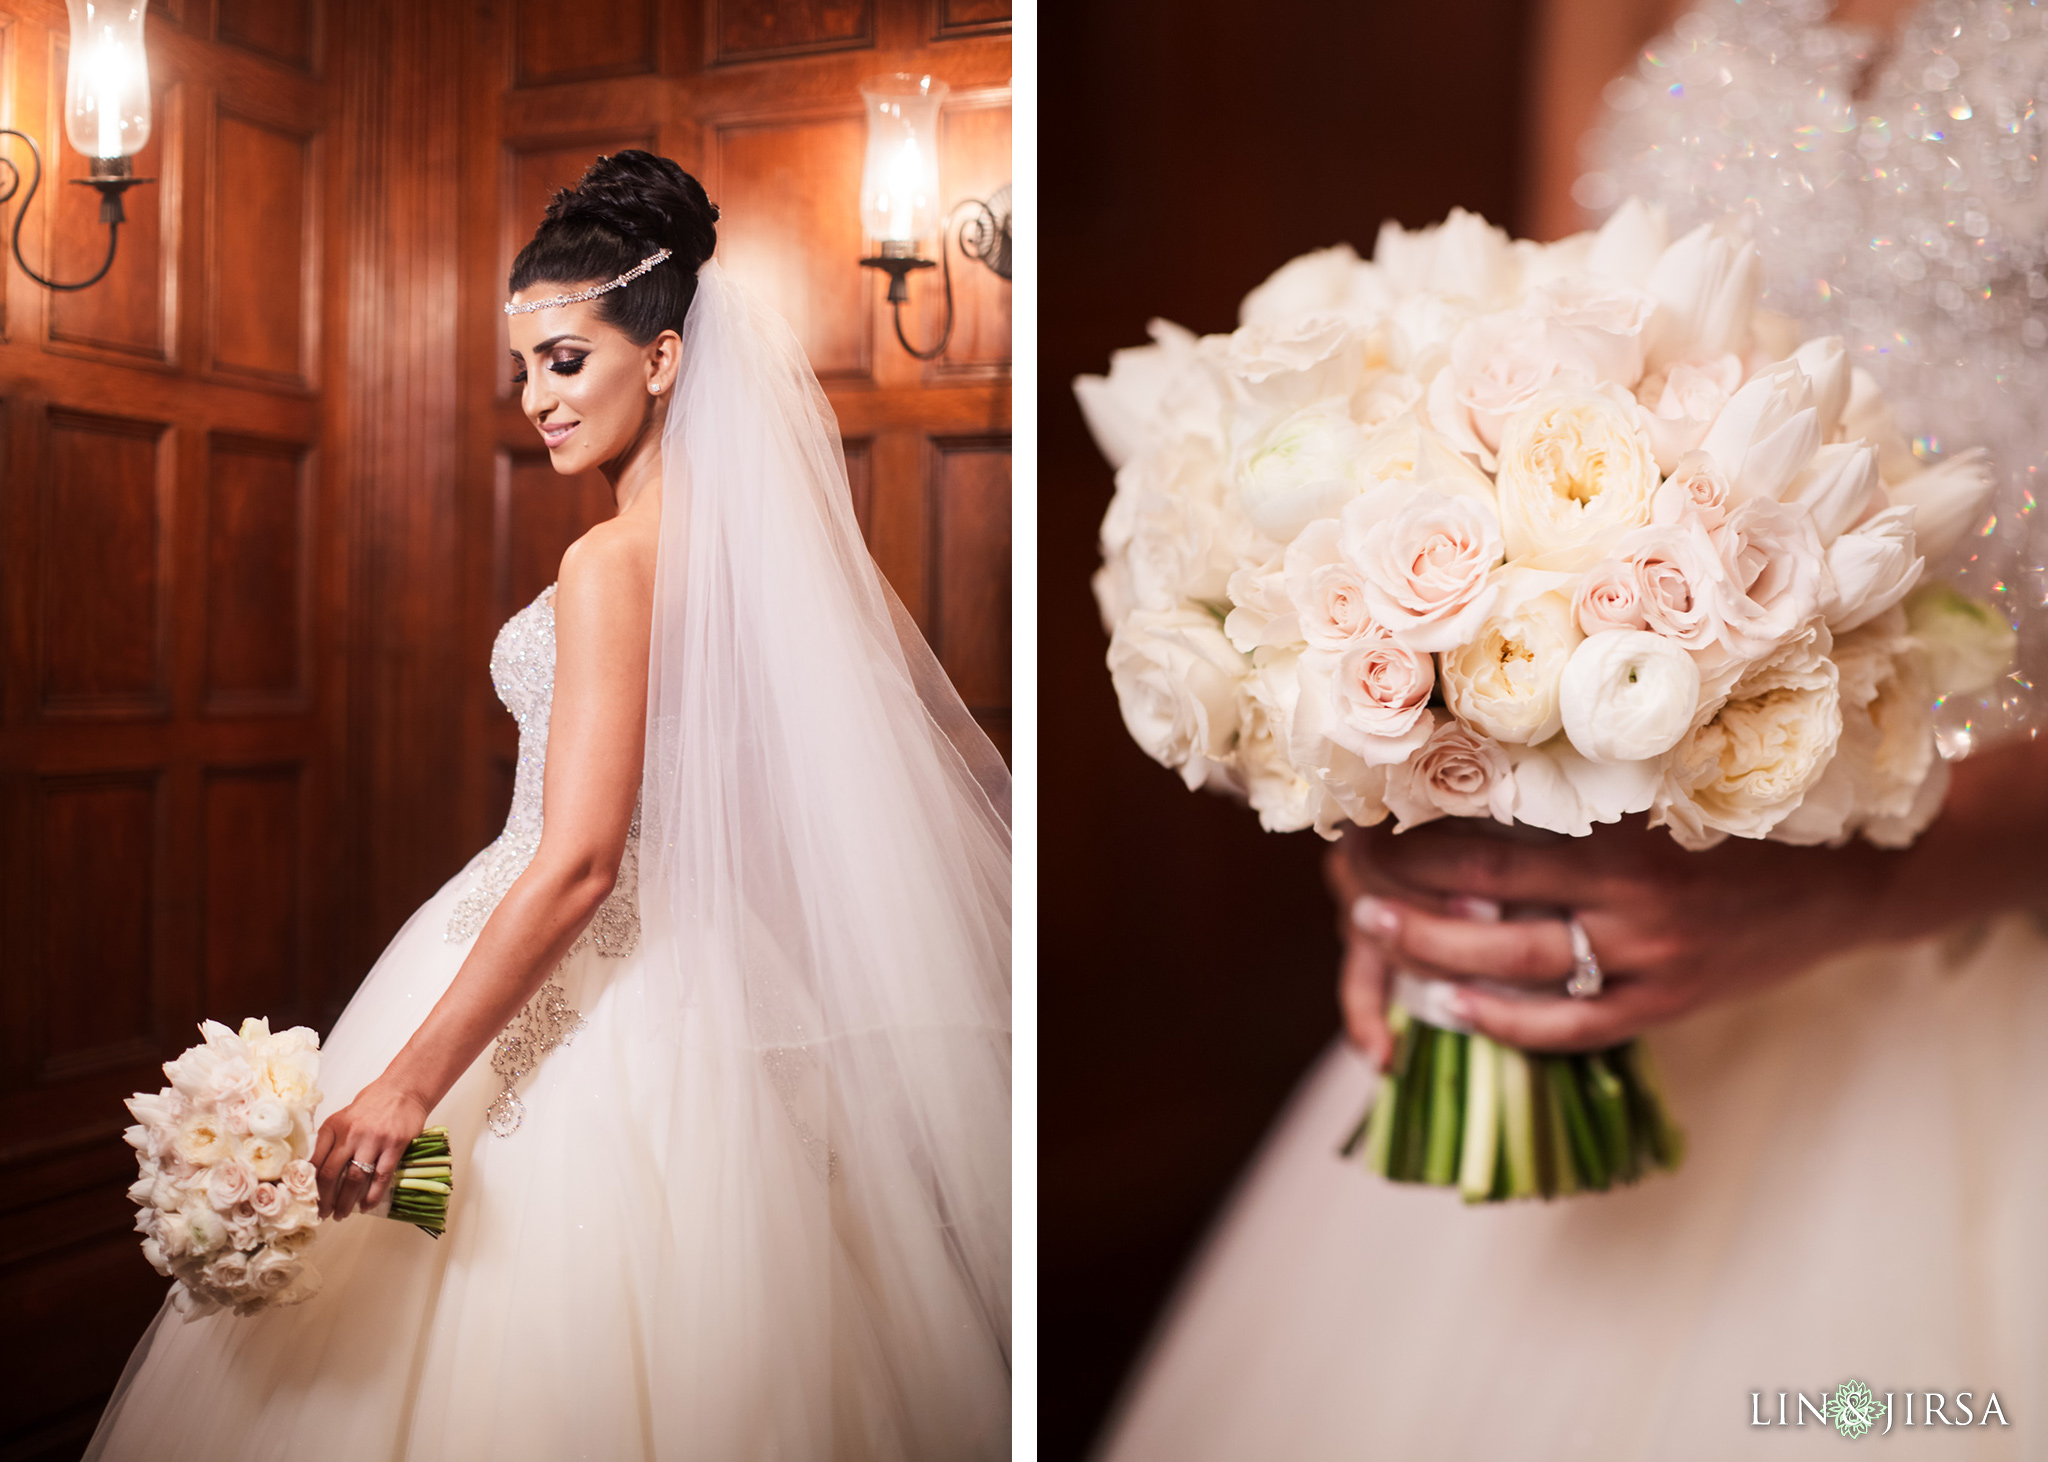 05 Biltmore Hotel Los Angeles Wedding Photography